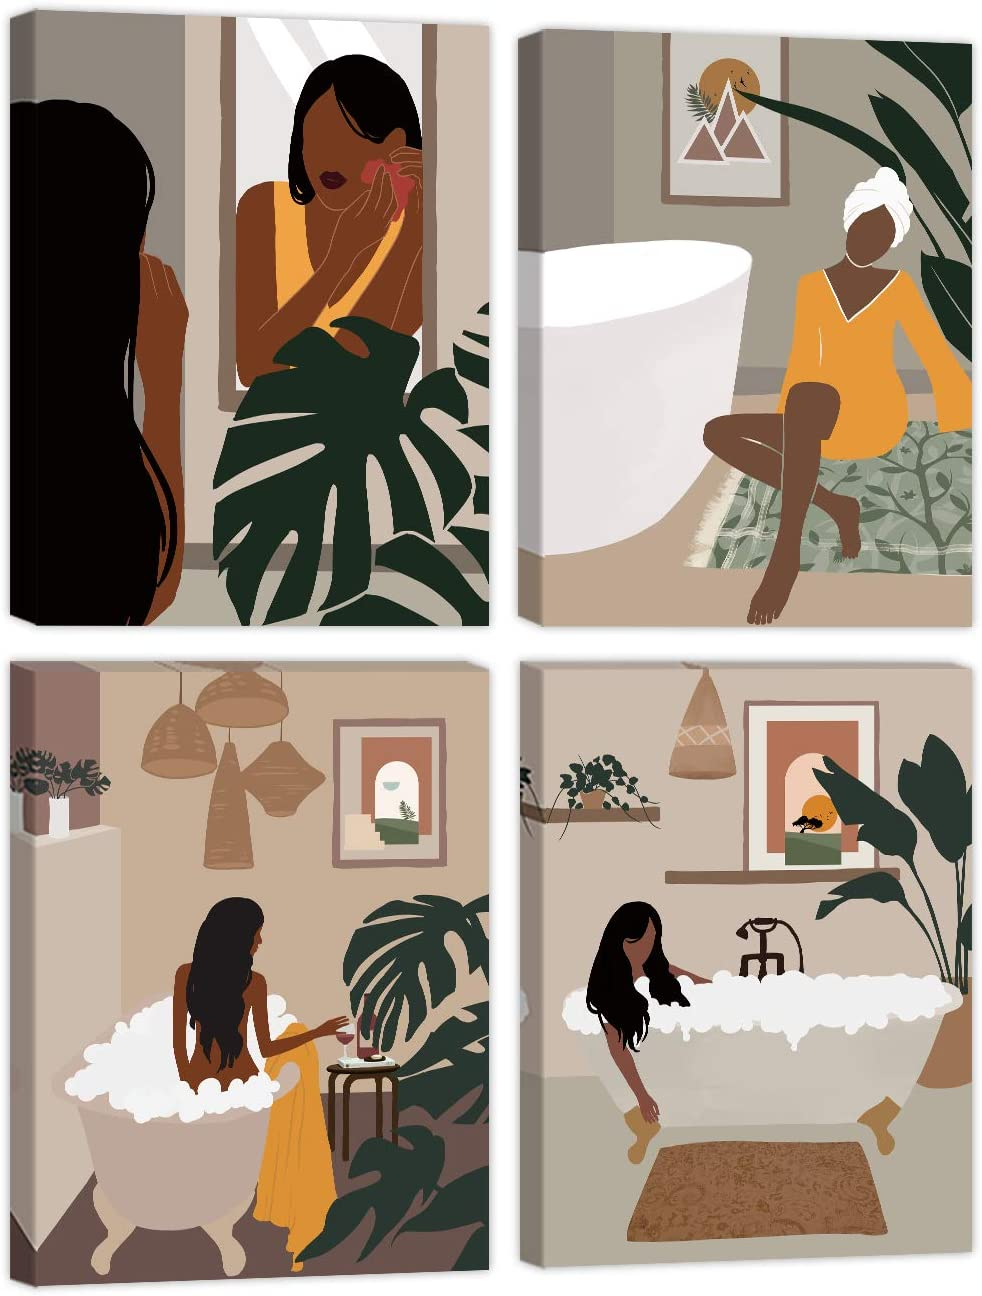 Black Girl Wall Art Bathroom Decor Black Woman Art Paintings for Wall Boho Modern Minimalist Leaf Bathroom Art Mid-Century Girl Bathtub SPA Home Decor for Bedroom Framed Ready to Hang 12x16 inch